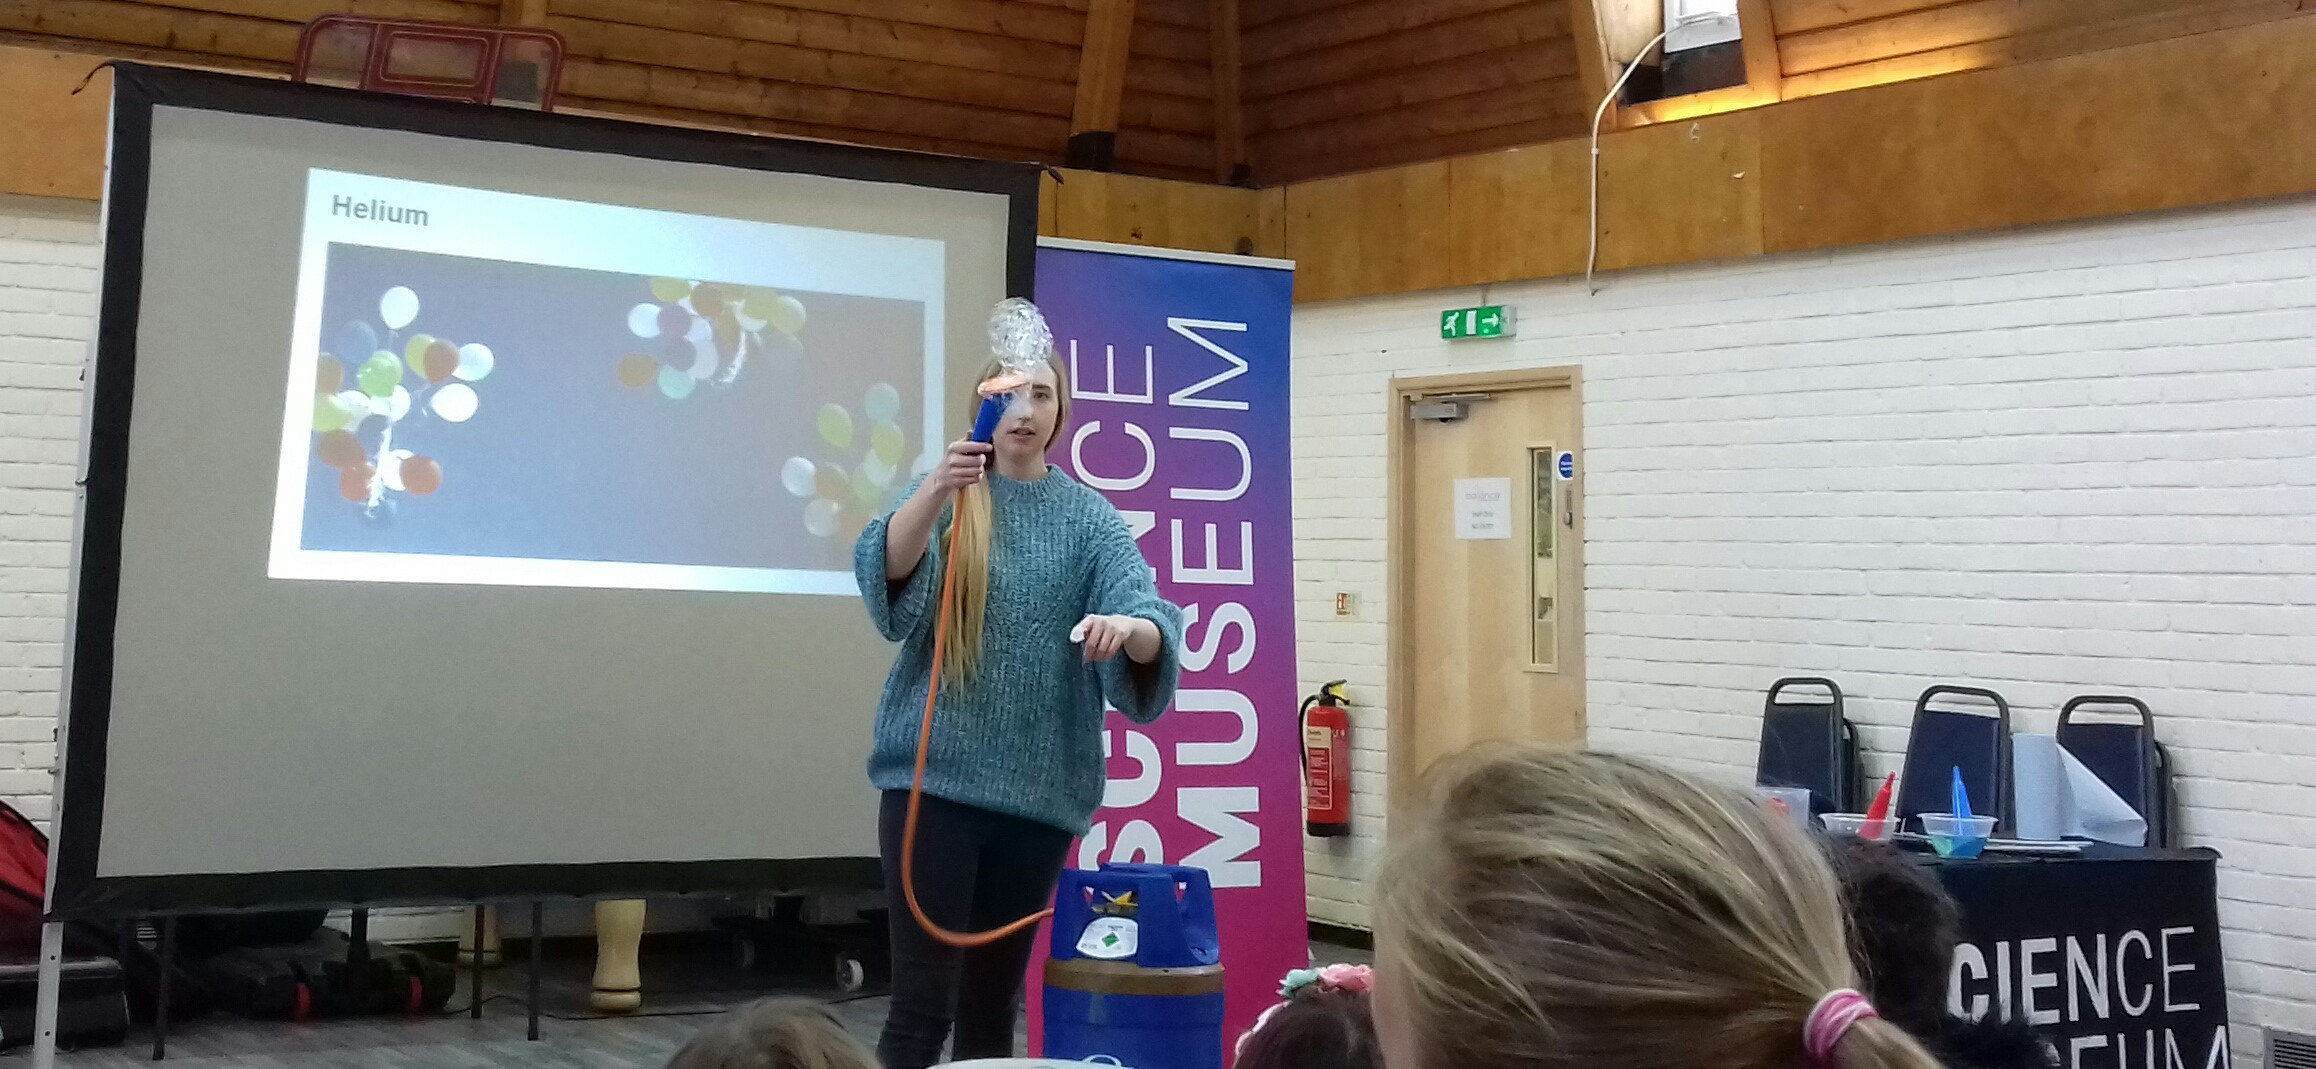 Kingston Carers take part in Science workshop!